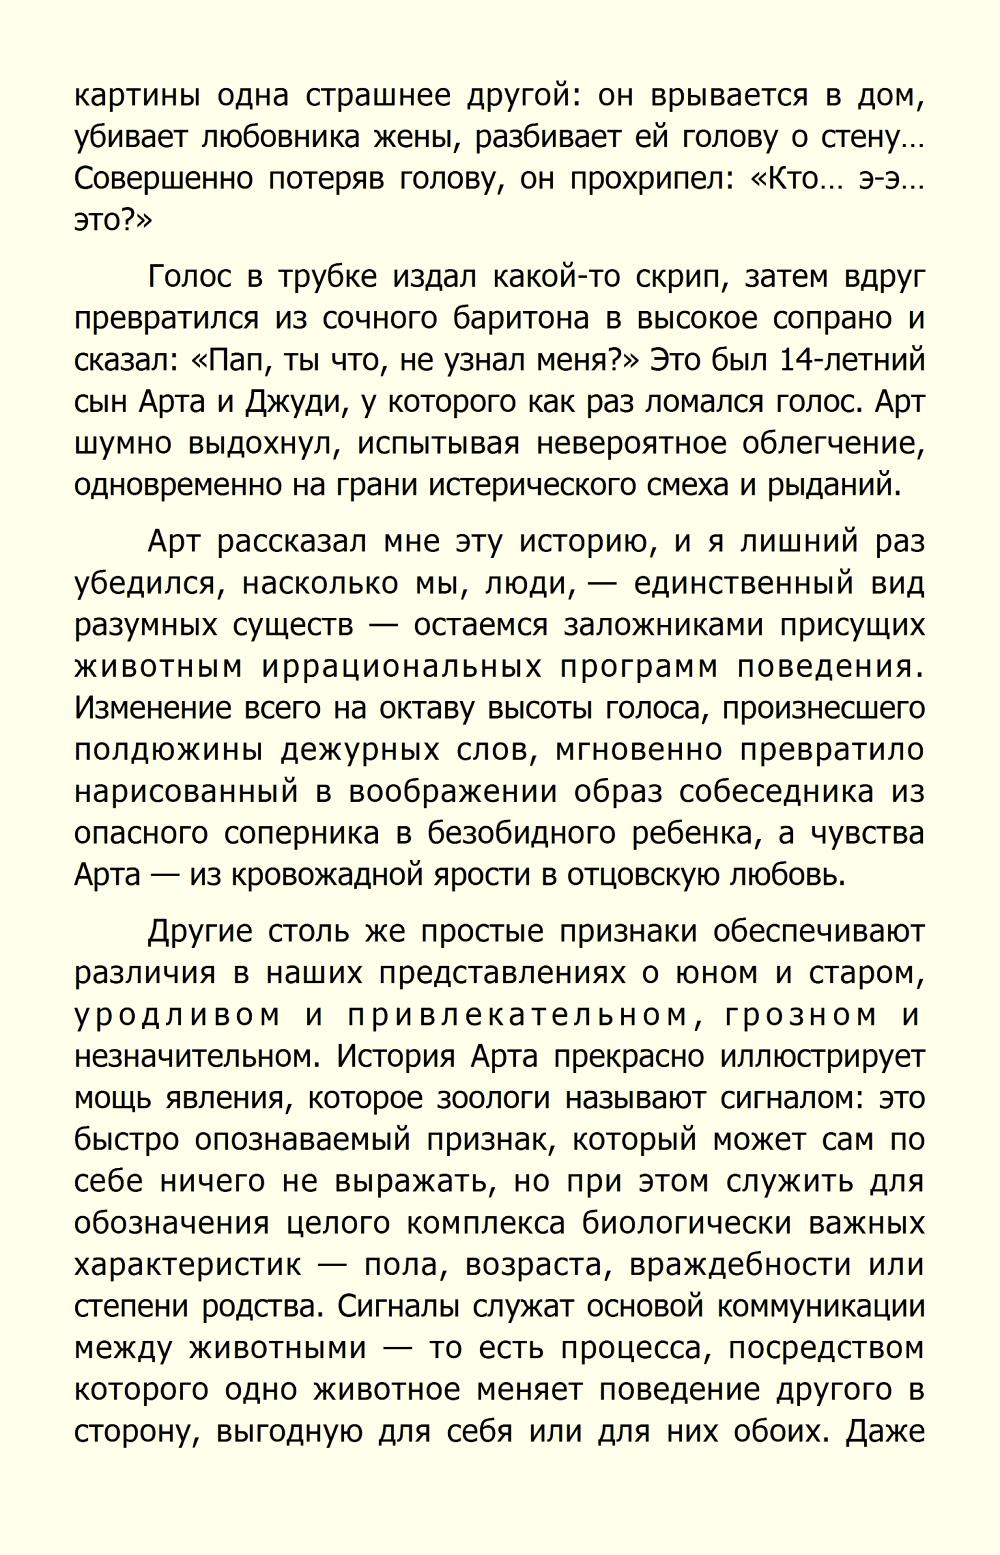 http://i5.imageban.ru/out/2014/01/21/81628cef54f95fa540bd1d214b4e98a7.jpg